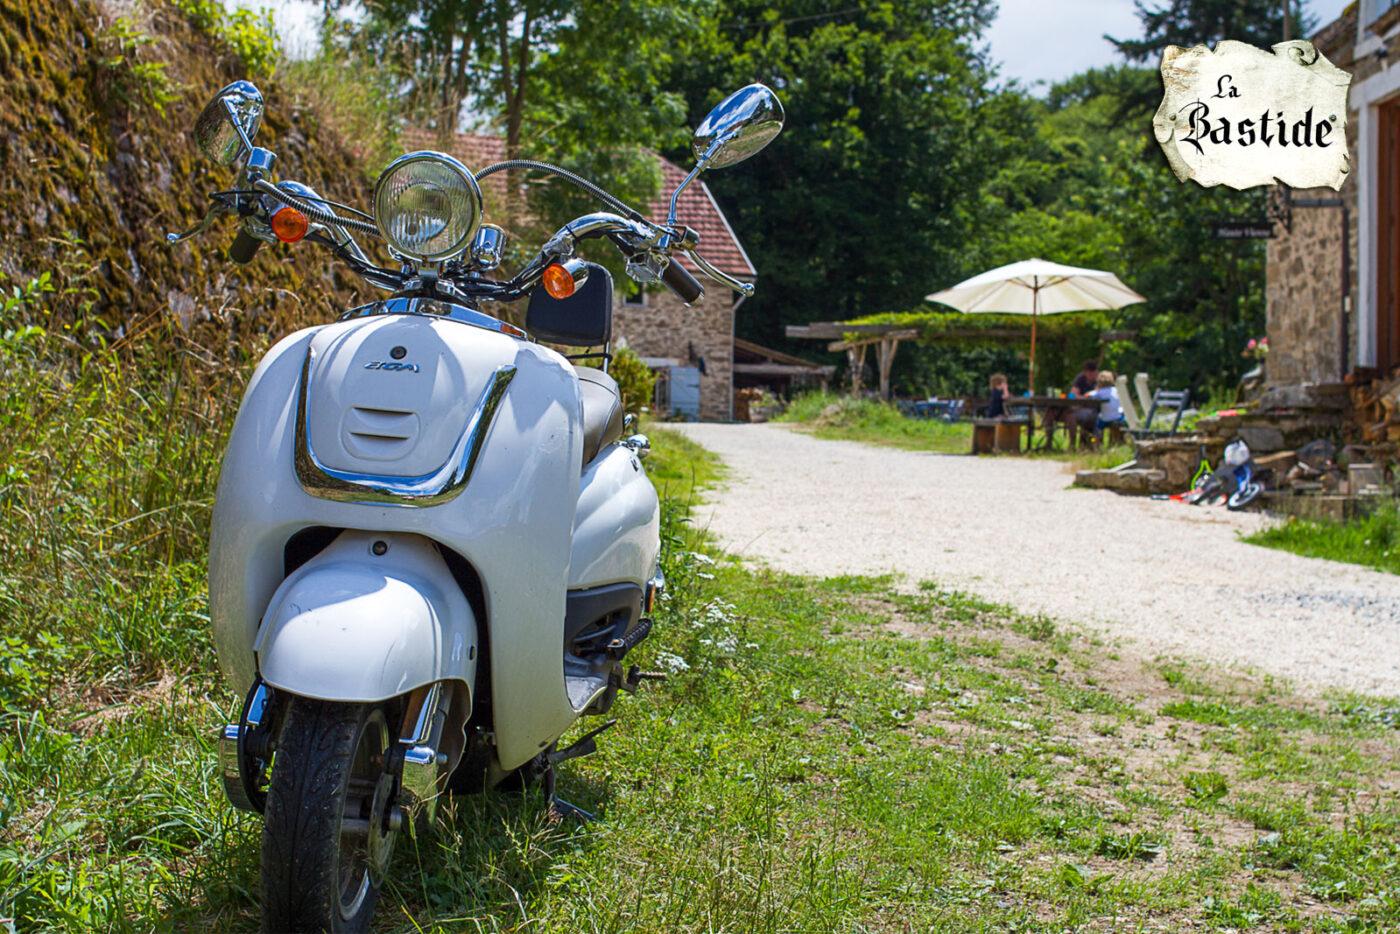 Routebeschrijving La-Bastide scooter vakantiedomein